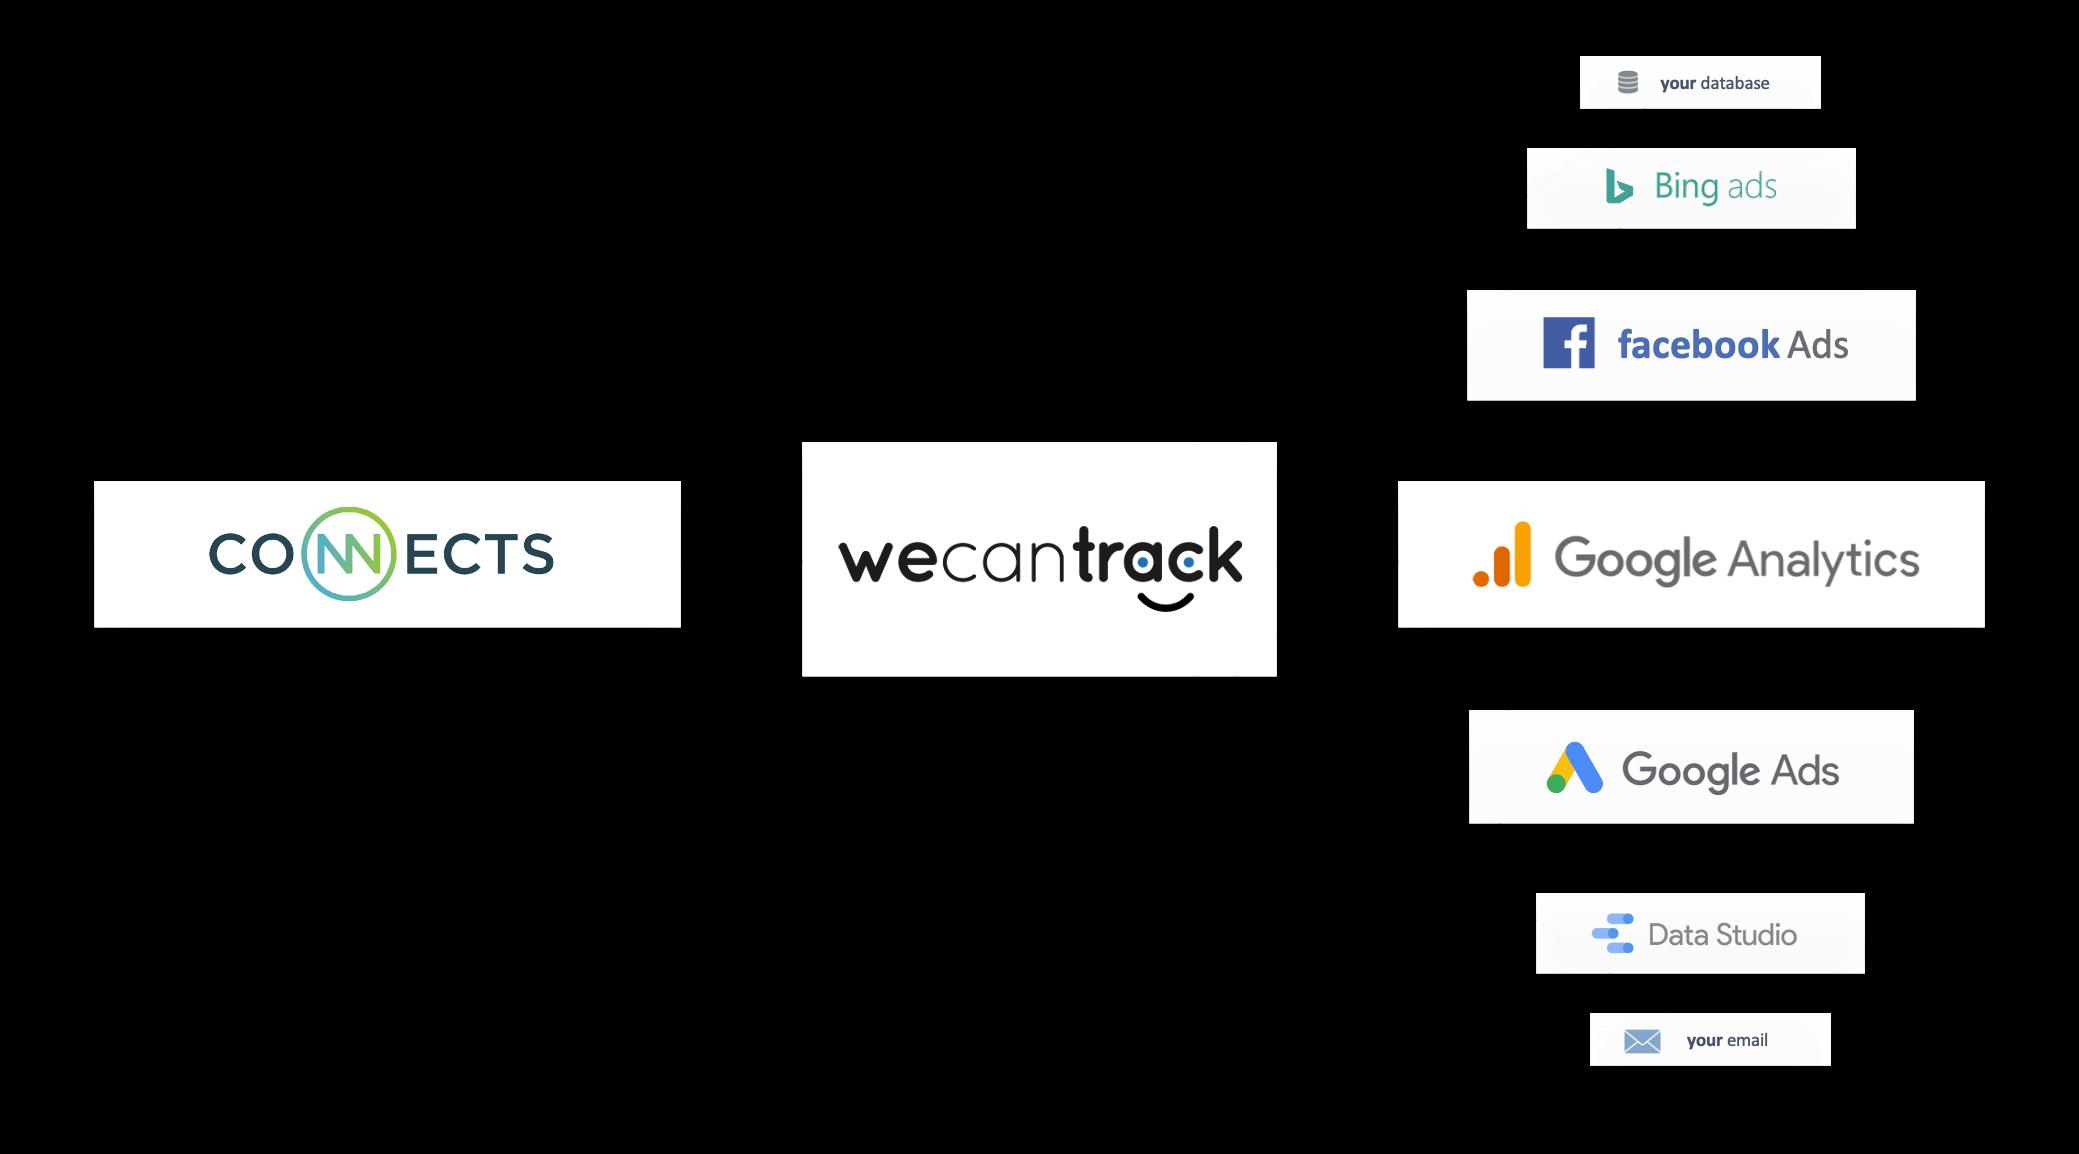 connects-affiliate-sales-integration-via-api